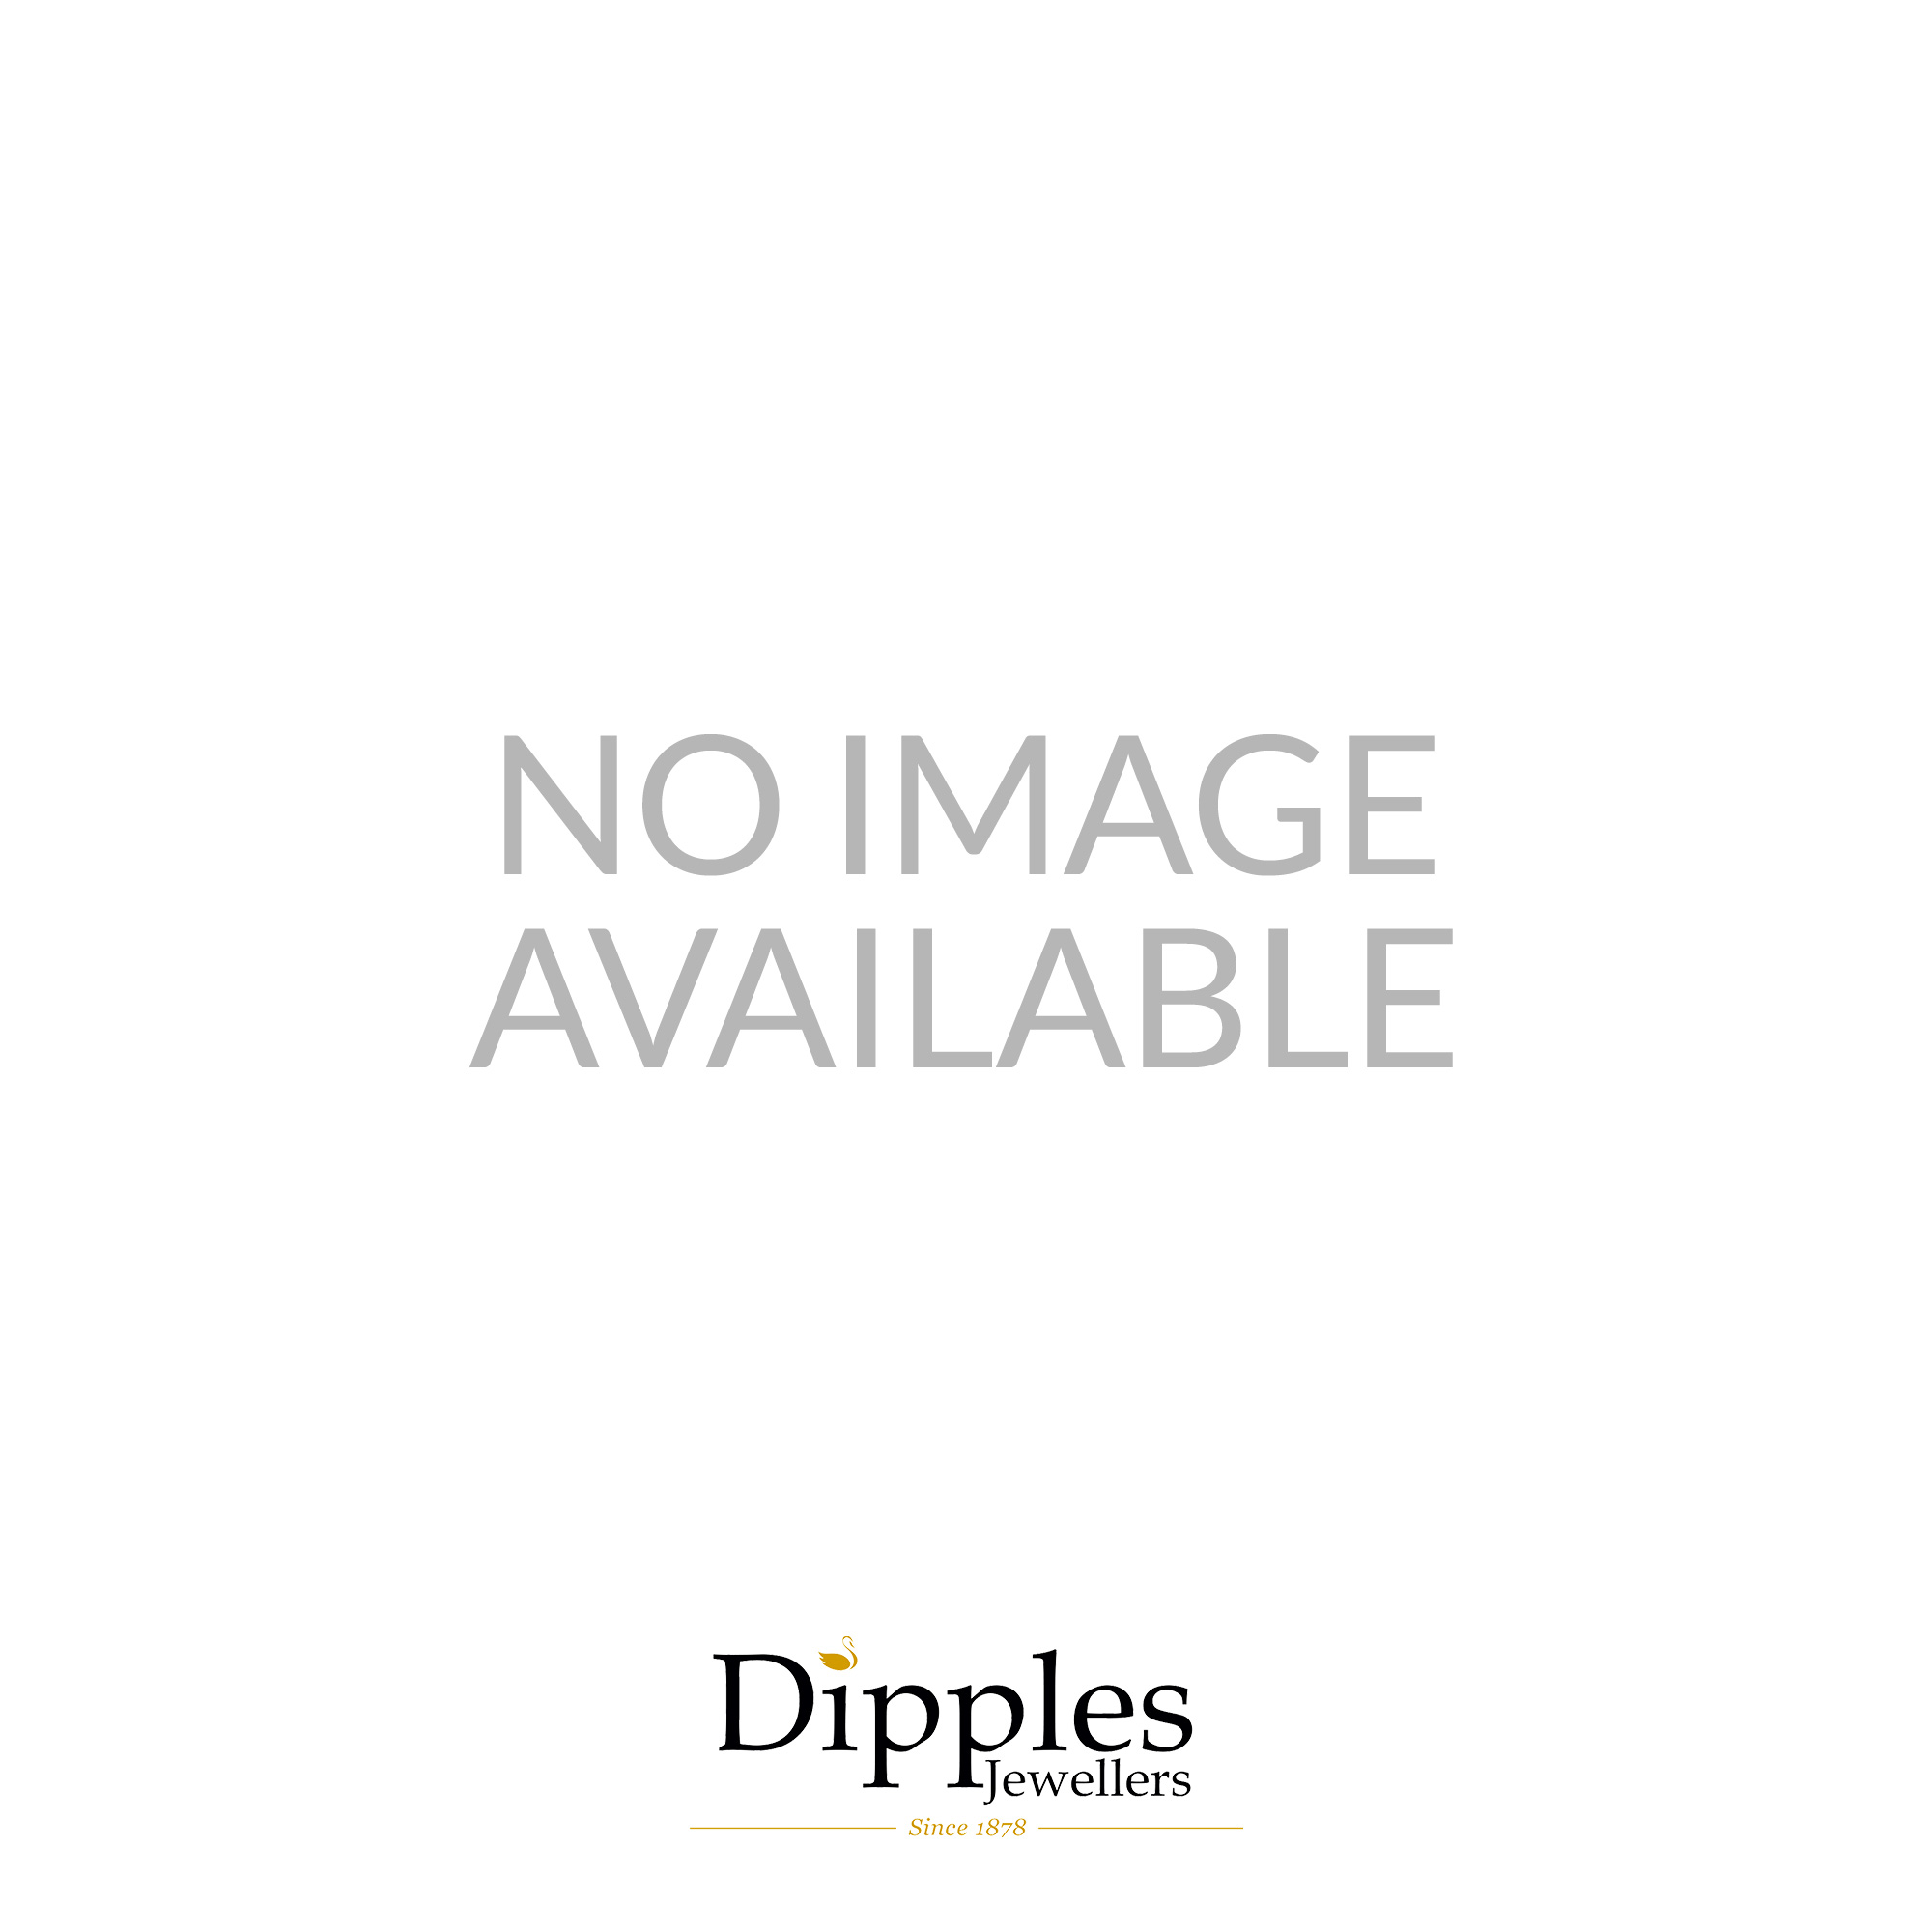 Chamilia Silver hanging charm - Keepsake Diploma scroll- Ltd edition 2014